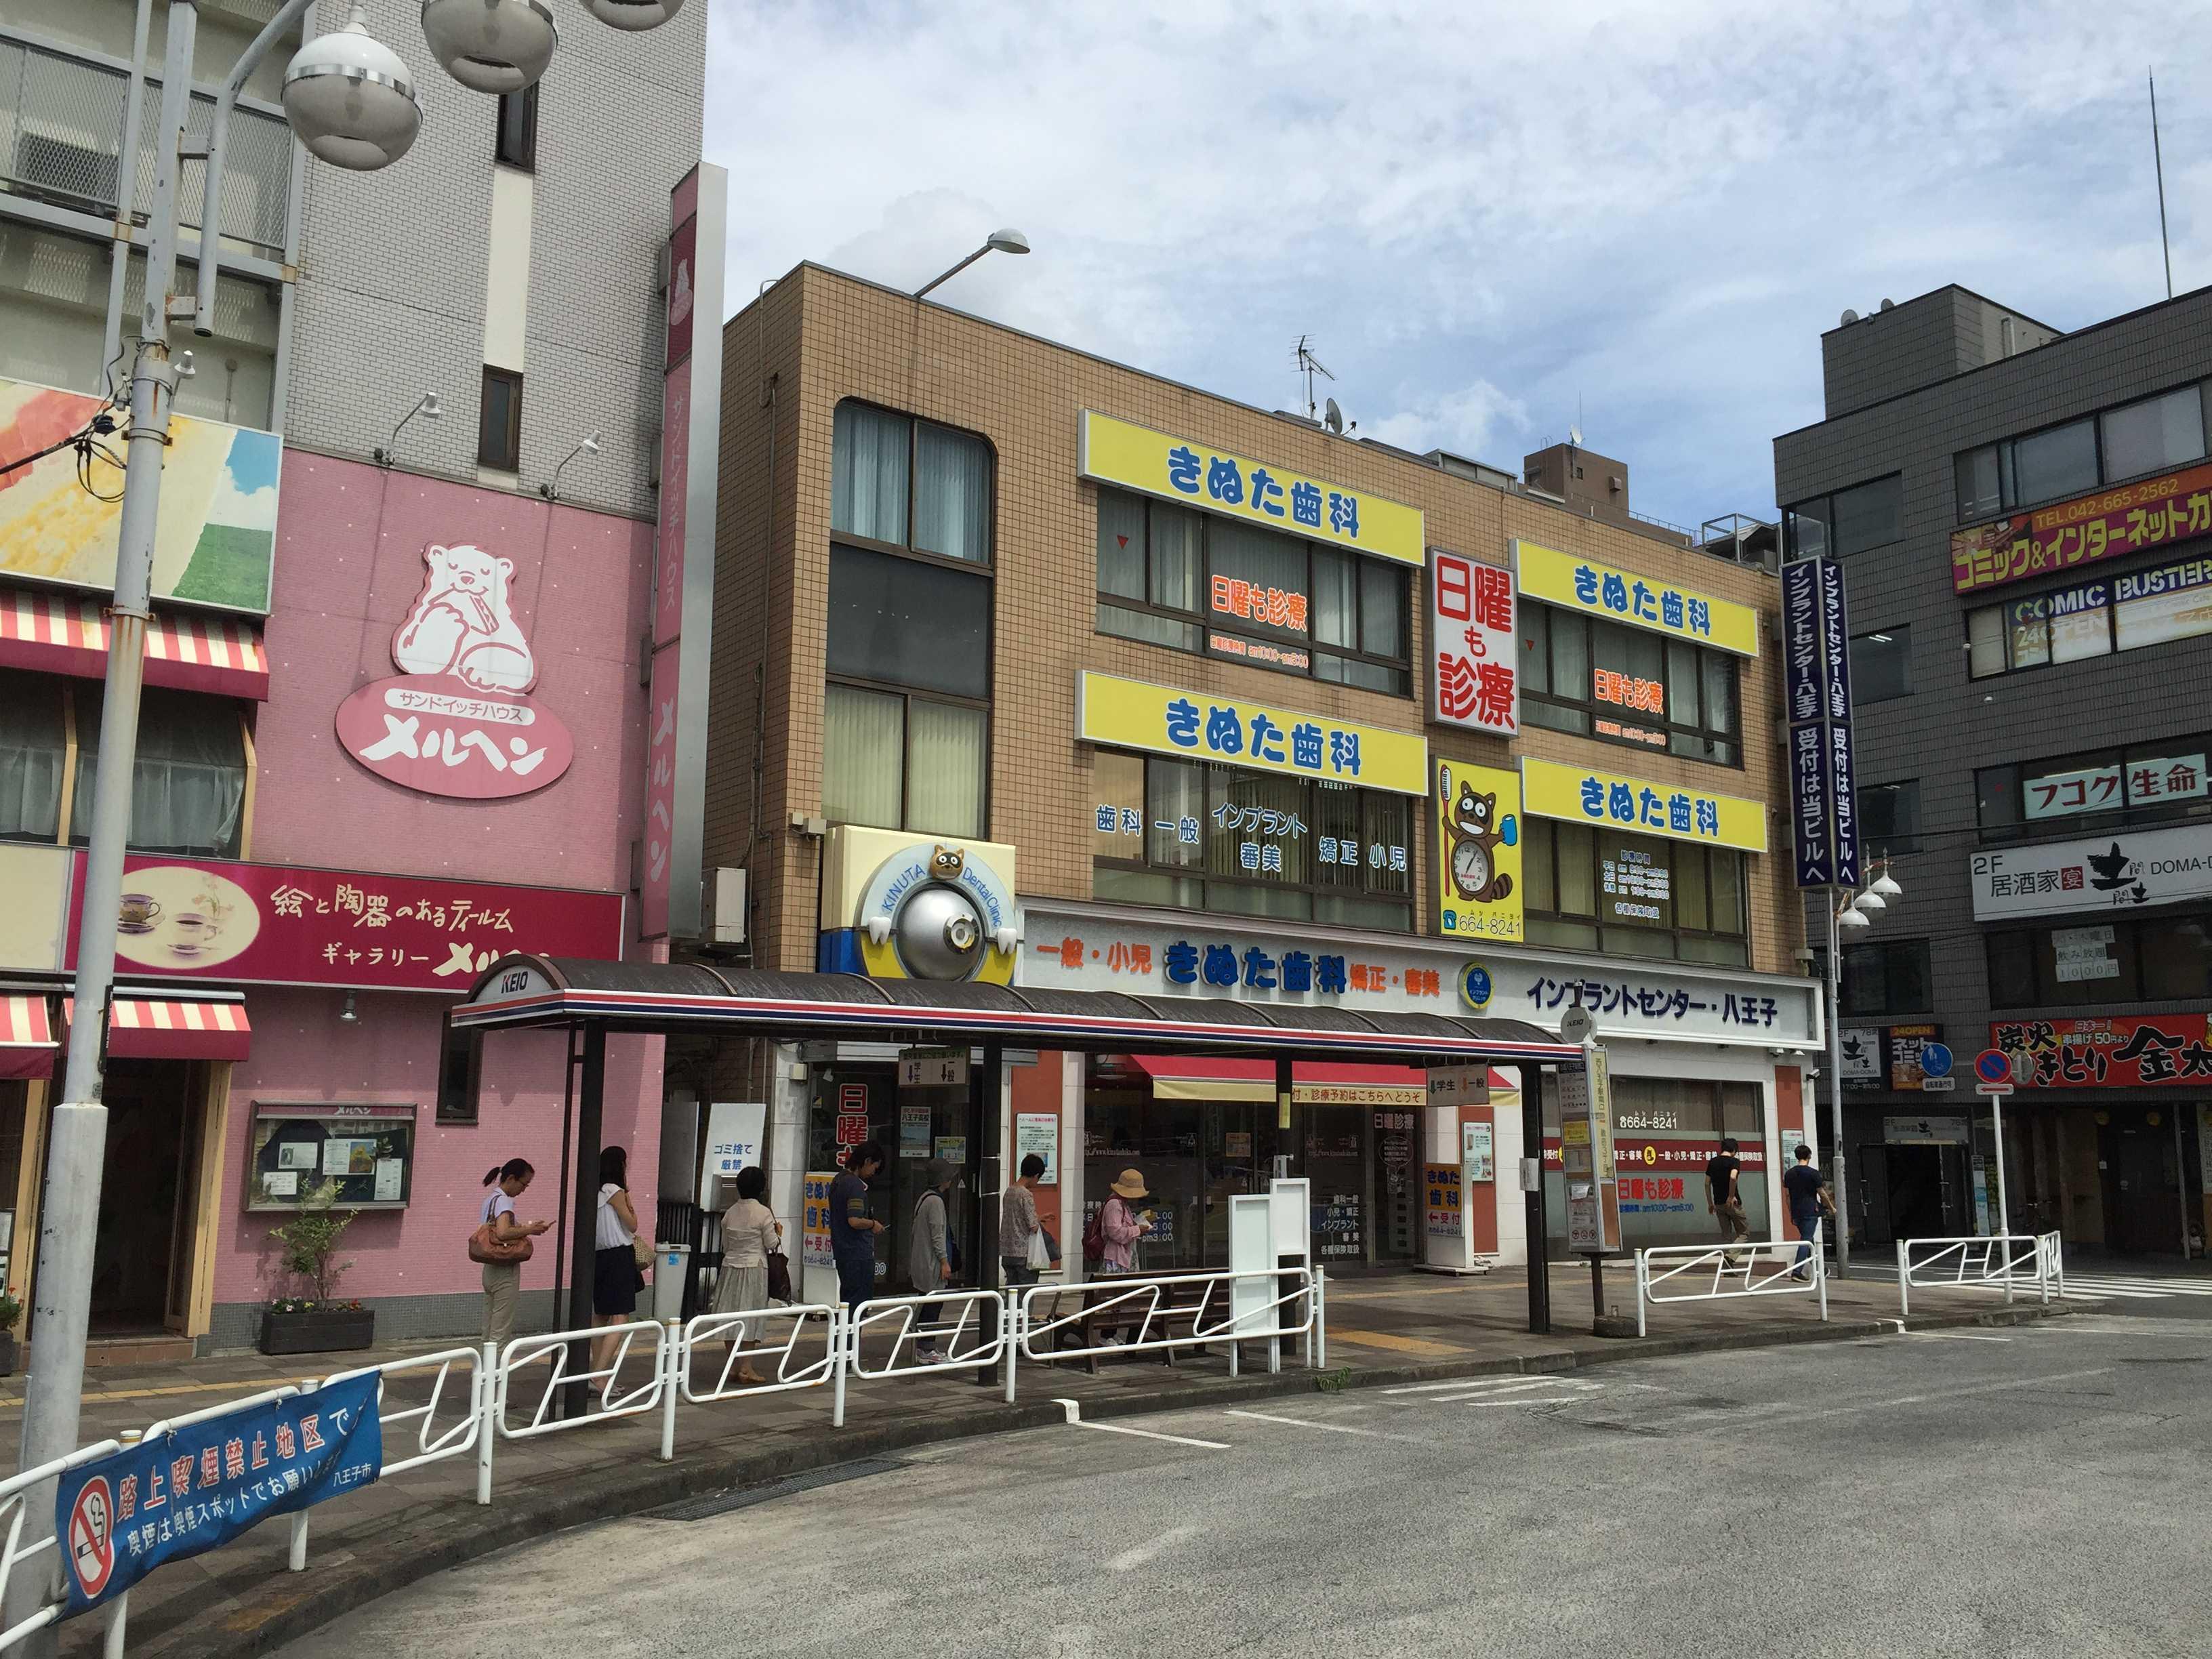 JR西八王子駅 南口 きぬた歯科(野立て看板で有名な歯医者さん)